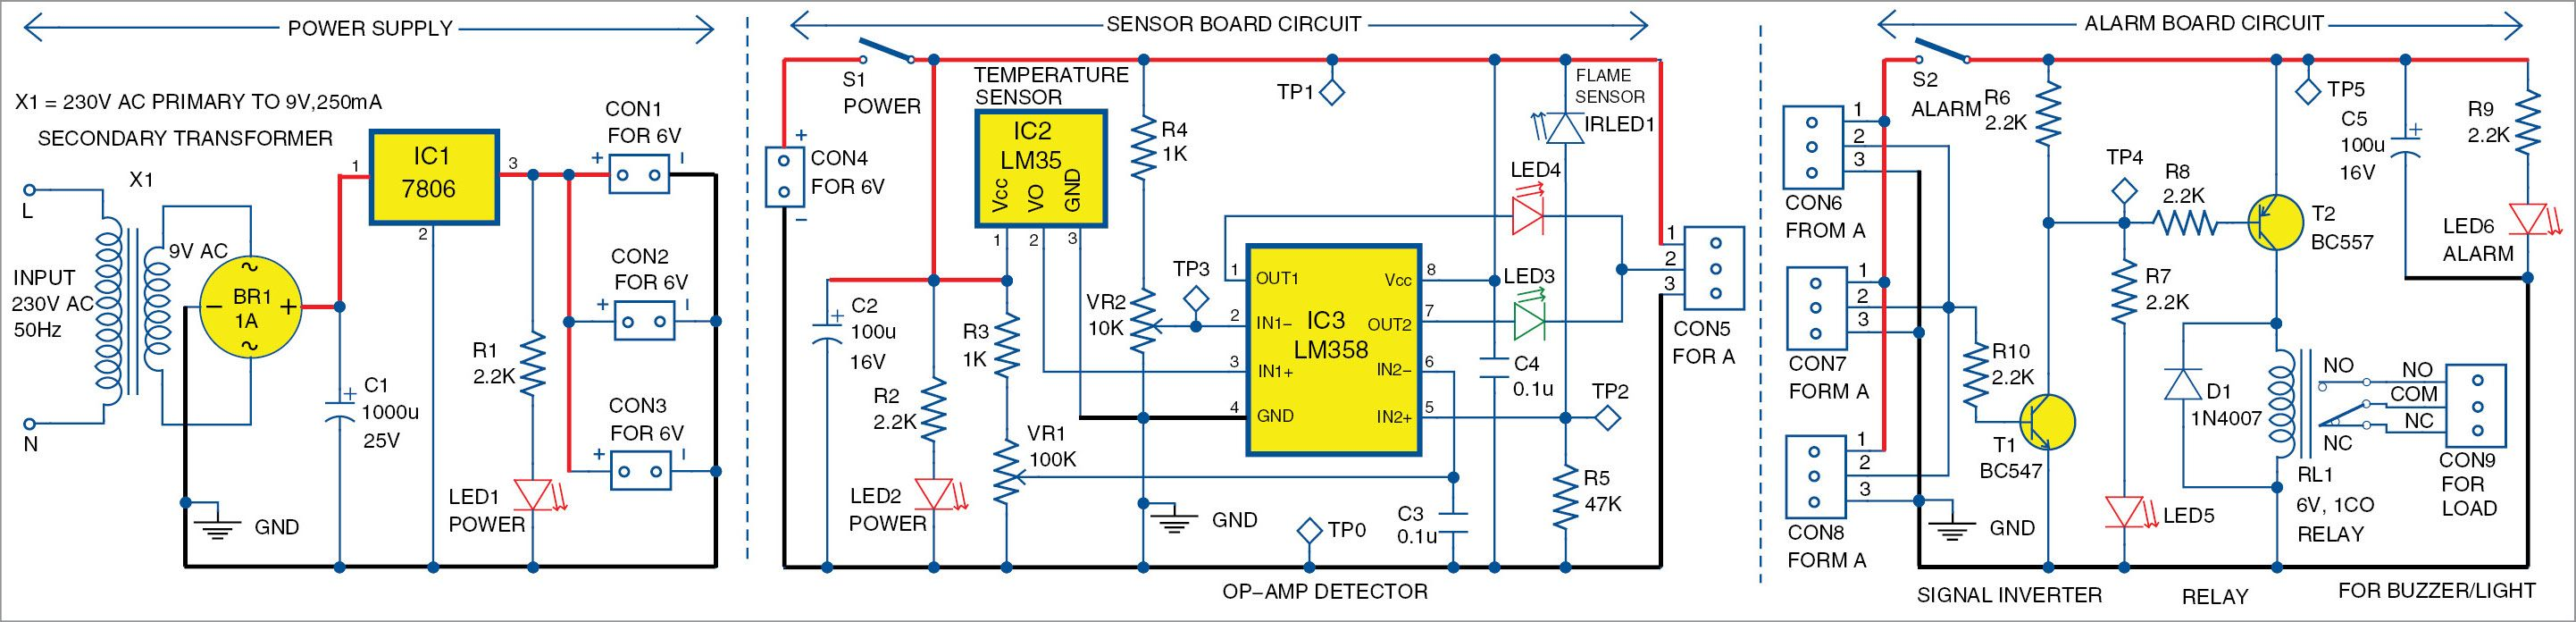 small resolution of simple multi sensor fire alarm